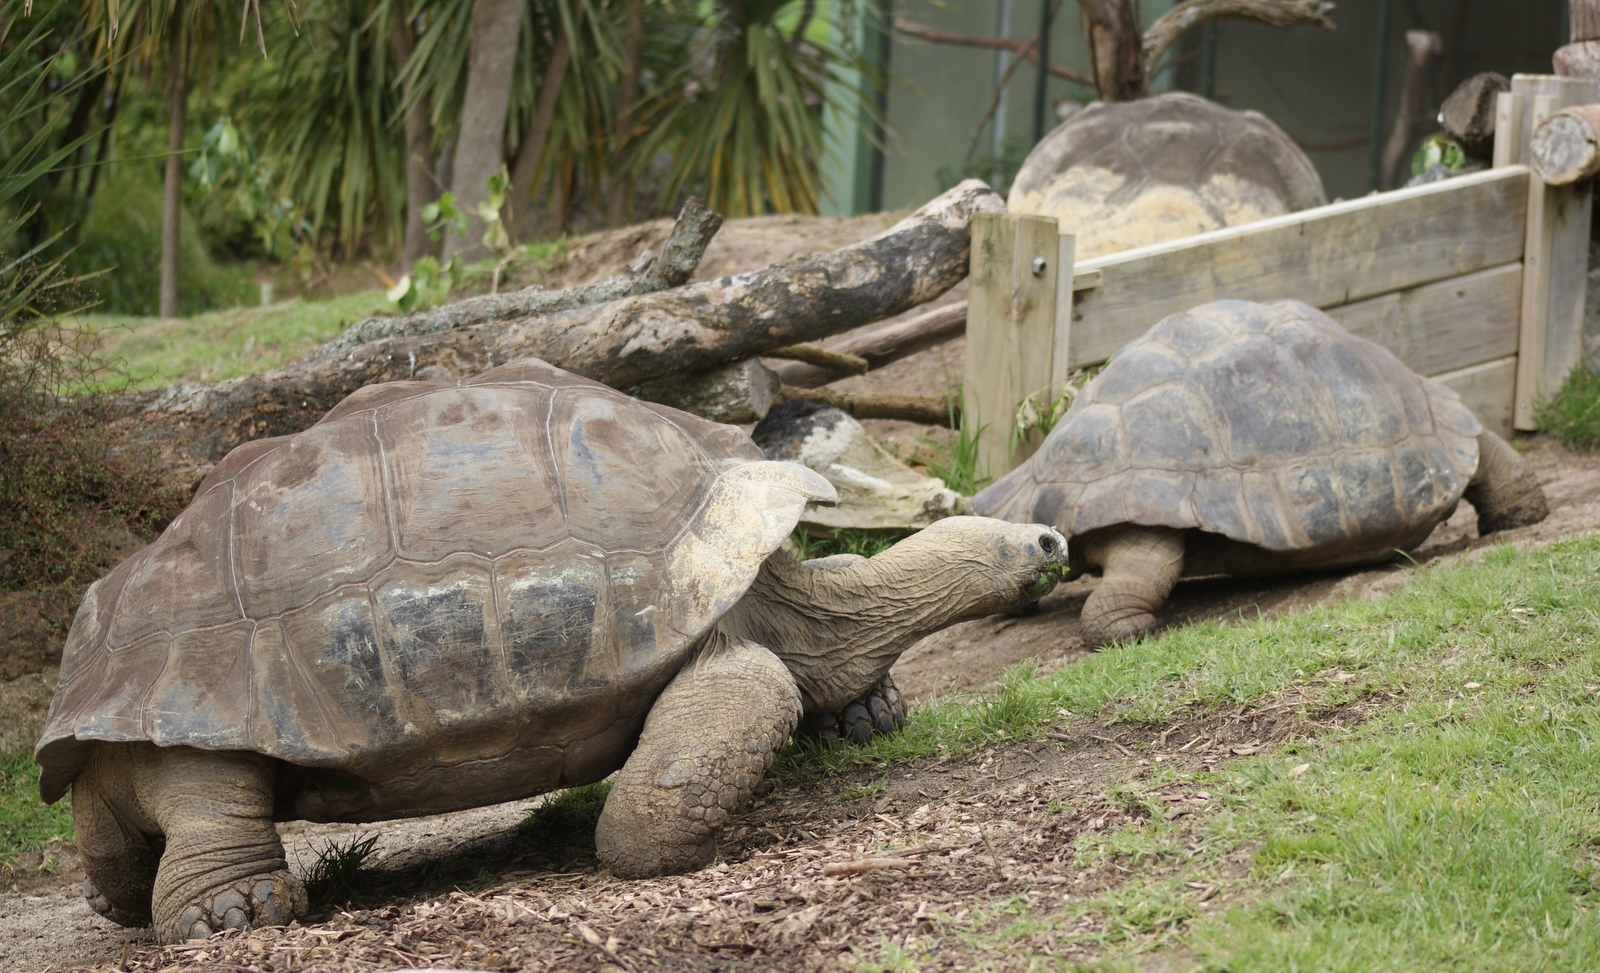 Turtle Back Zoo Savannah Cafe Menu